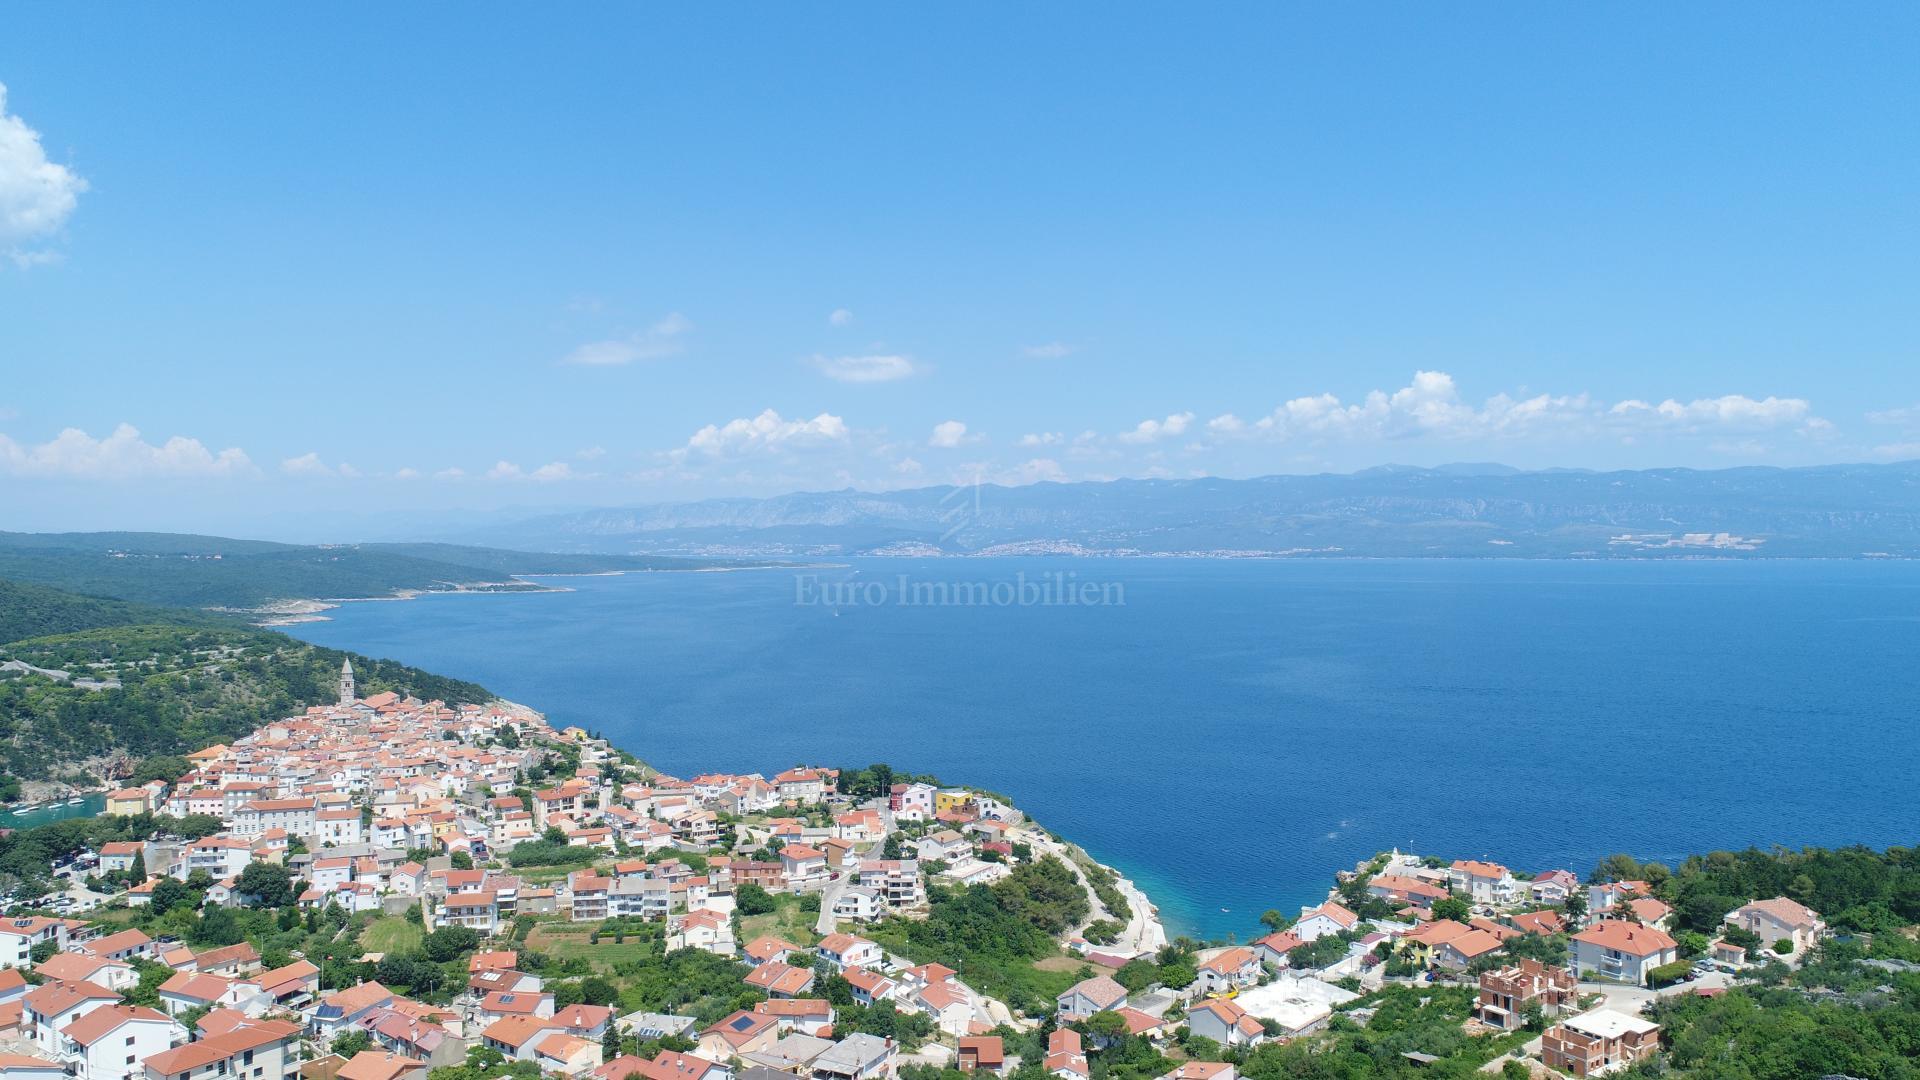 Građevinsko zemljište s prekrasnim pogledom na more